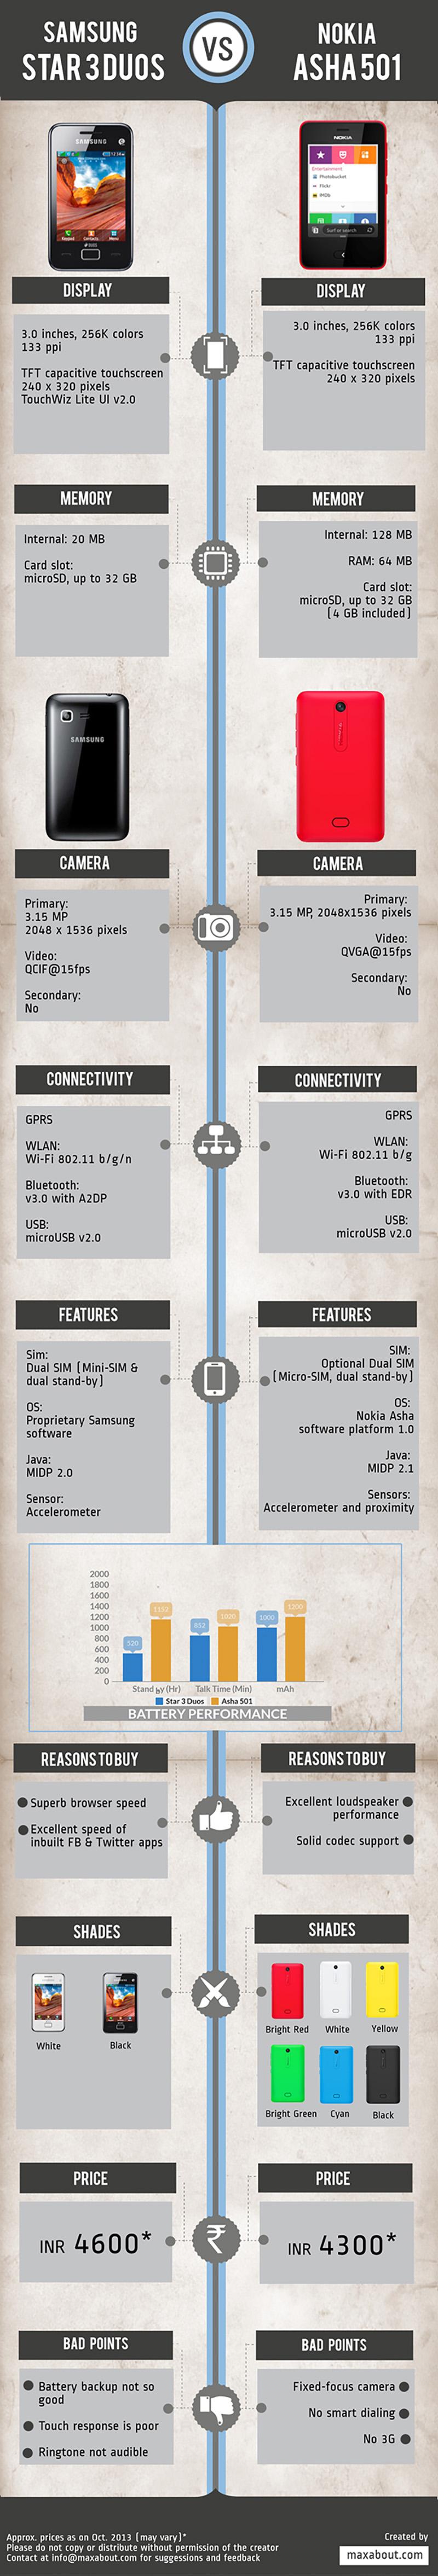 Nokia Asha 501 vs. Samsung Star 3 Duos Nokia asha 501